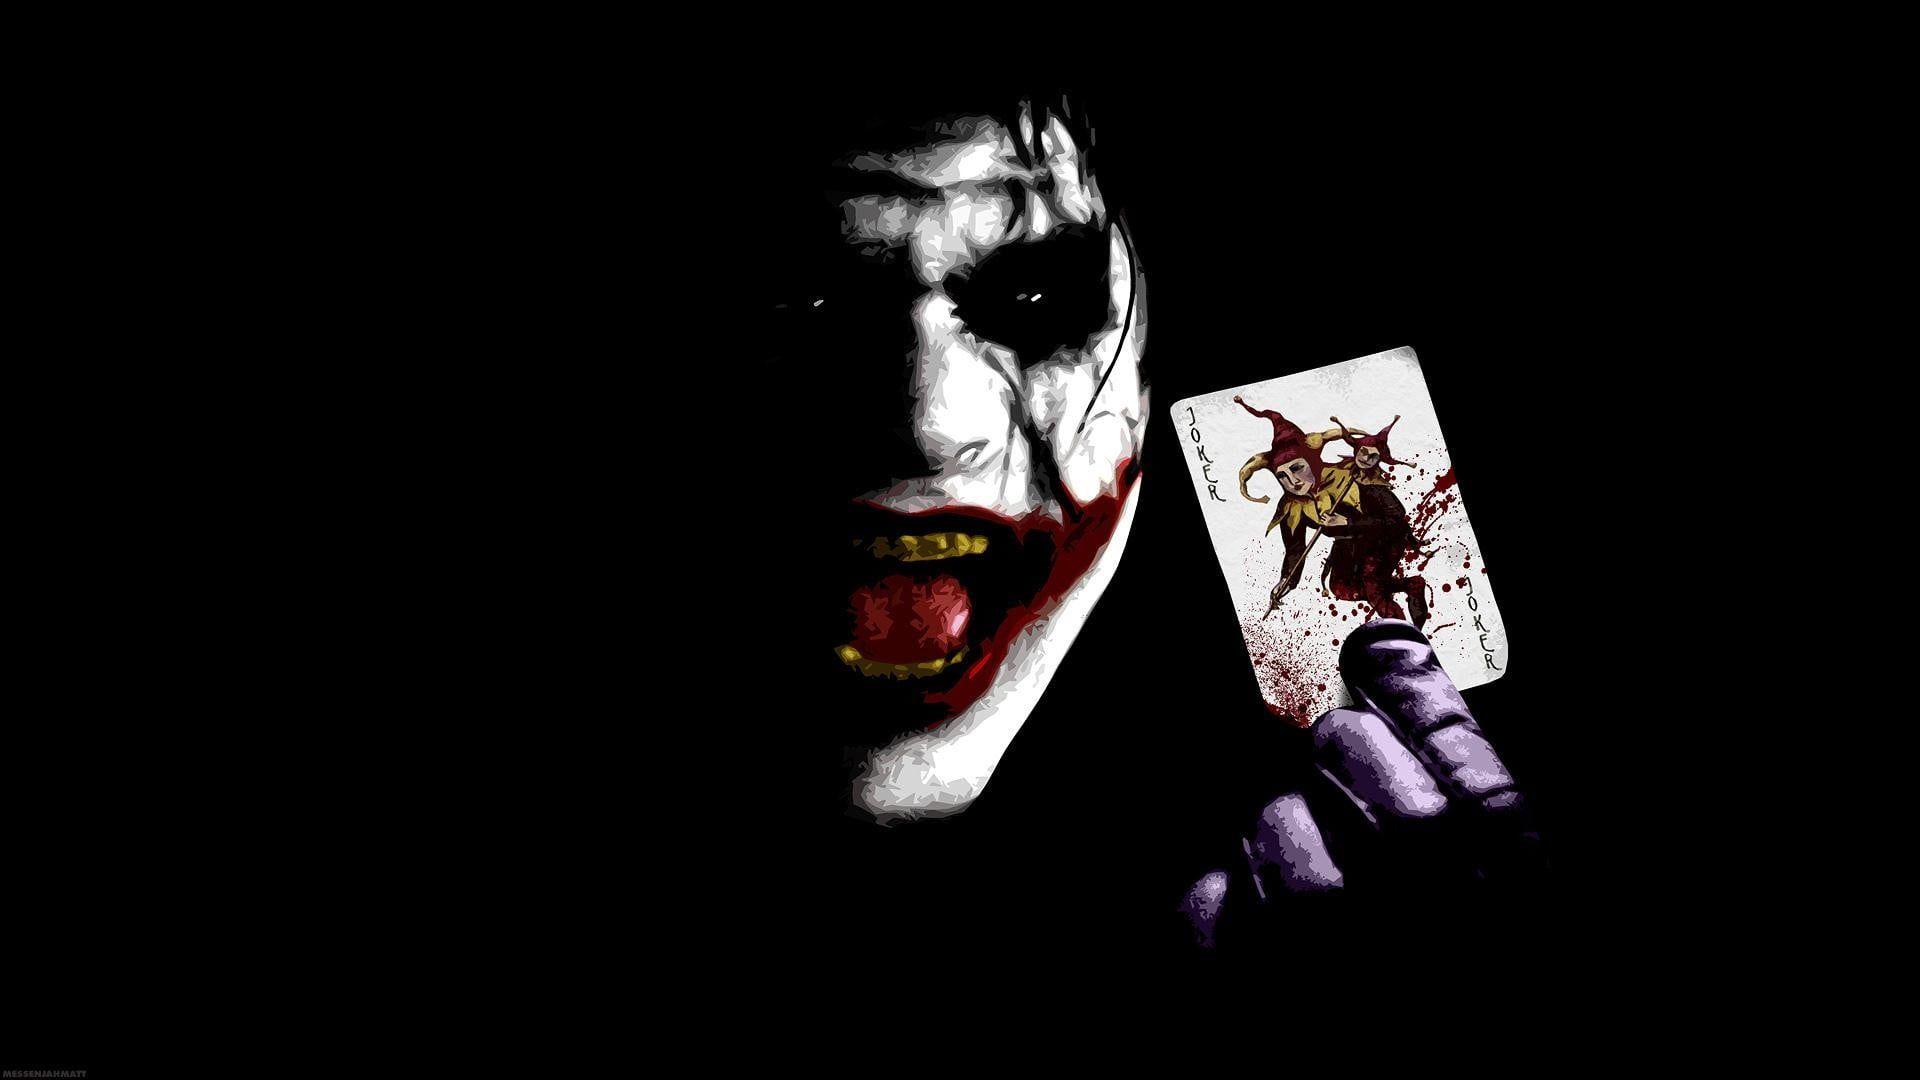 The Joker Digital Wallpaper Joker Black Movies Dc Comics Playing Cards 1080p Wallpaper Hdwallpaper D Joker Hd Wallpaper Joker Wallpaper Joker Wallpapers